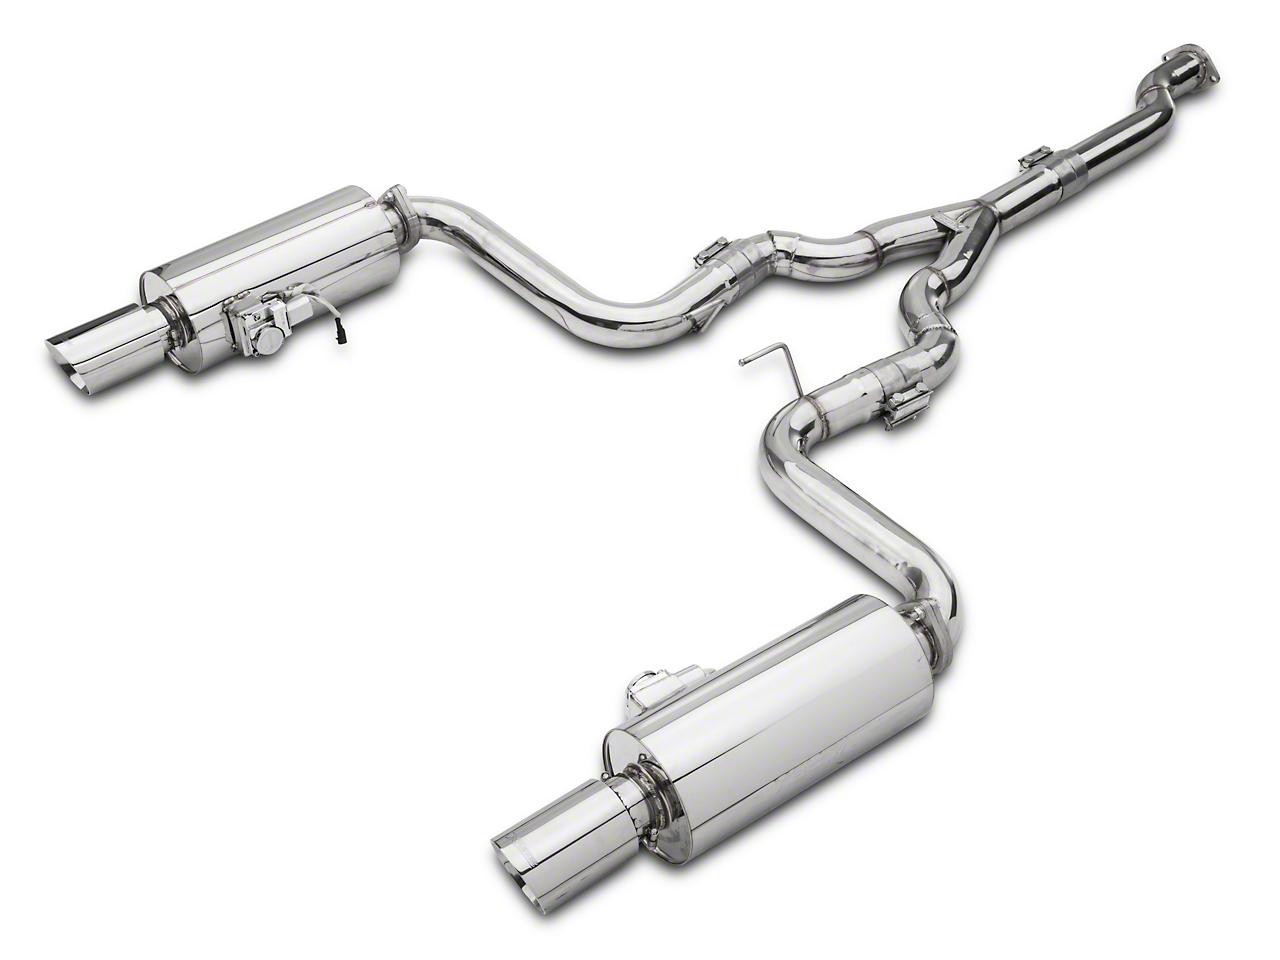 X-Force Varex Catback Exhaust (15-16 Ecoboost)